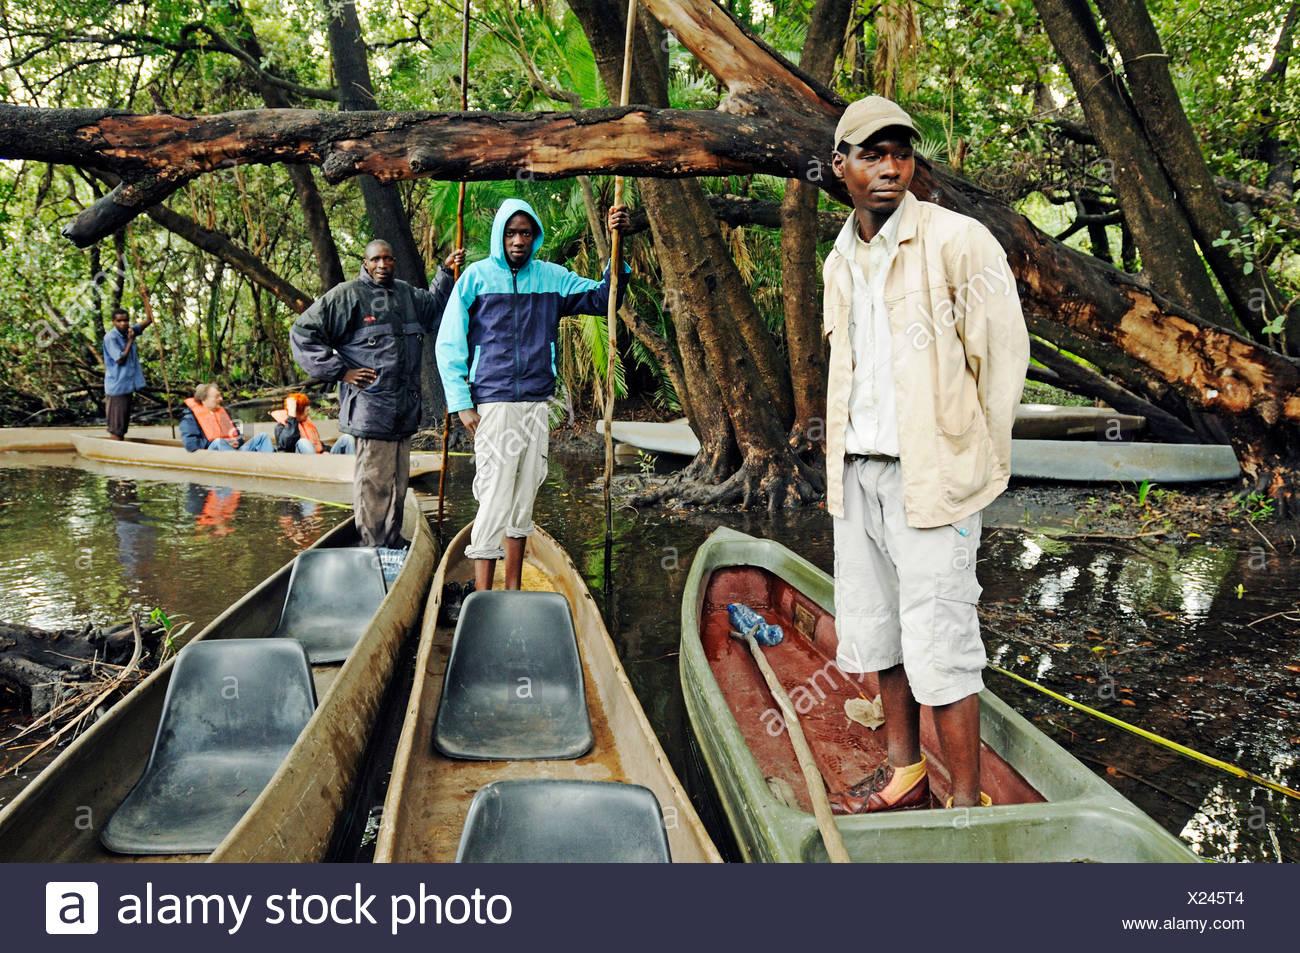 Guides and boatmen, with pole on mokoro or makoro canoes, Okavango Delta, Botswana, Africa - Stock Image